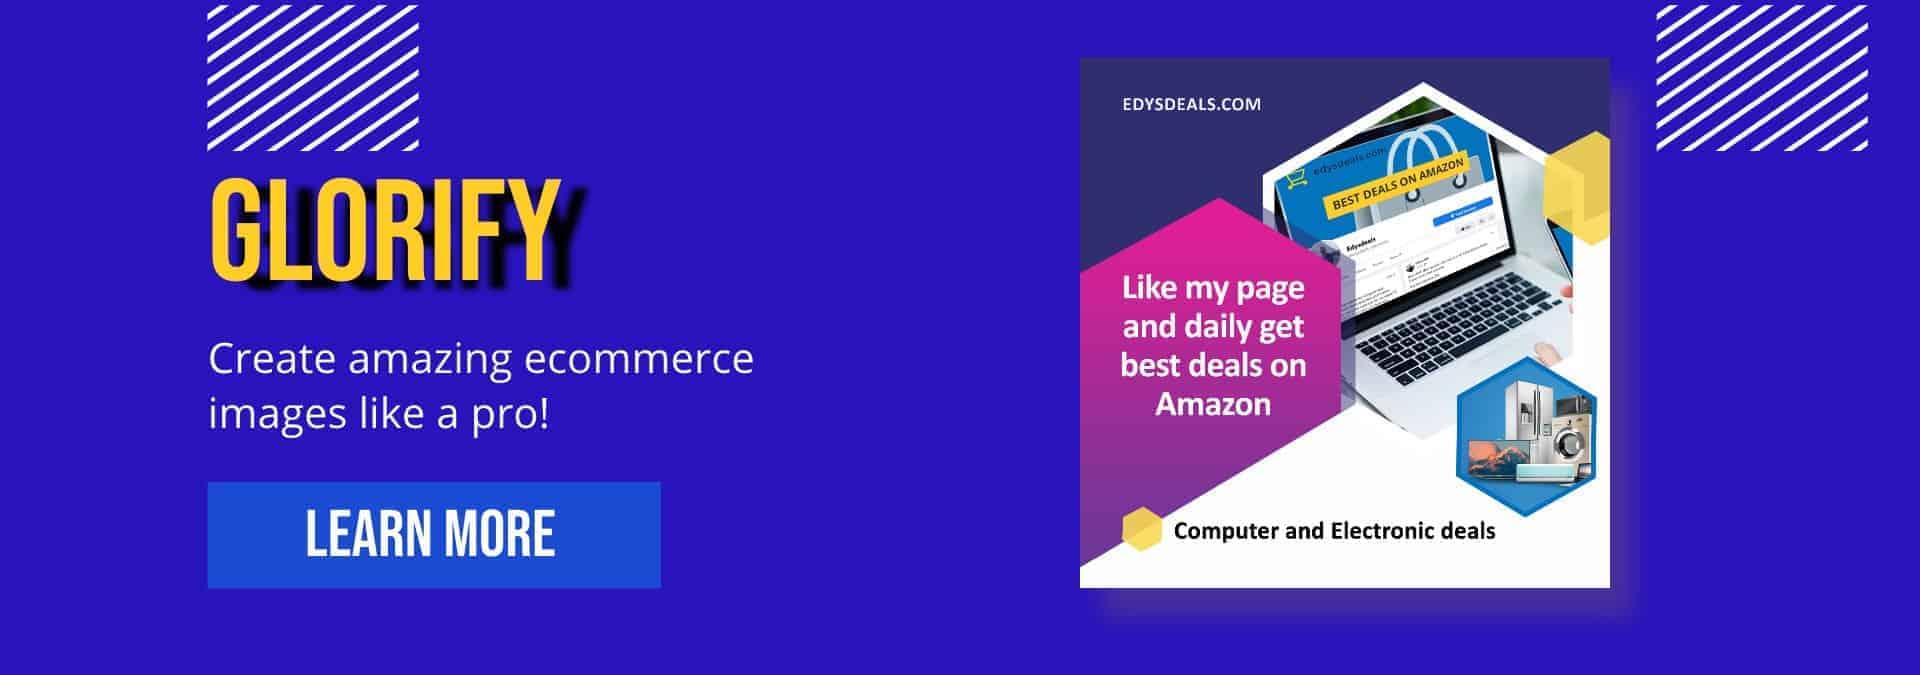 ecommerce images